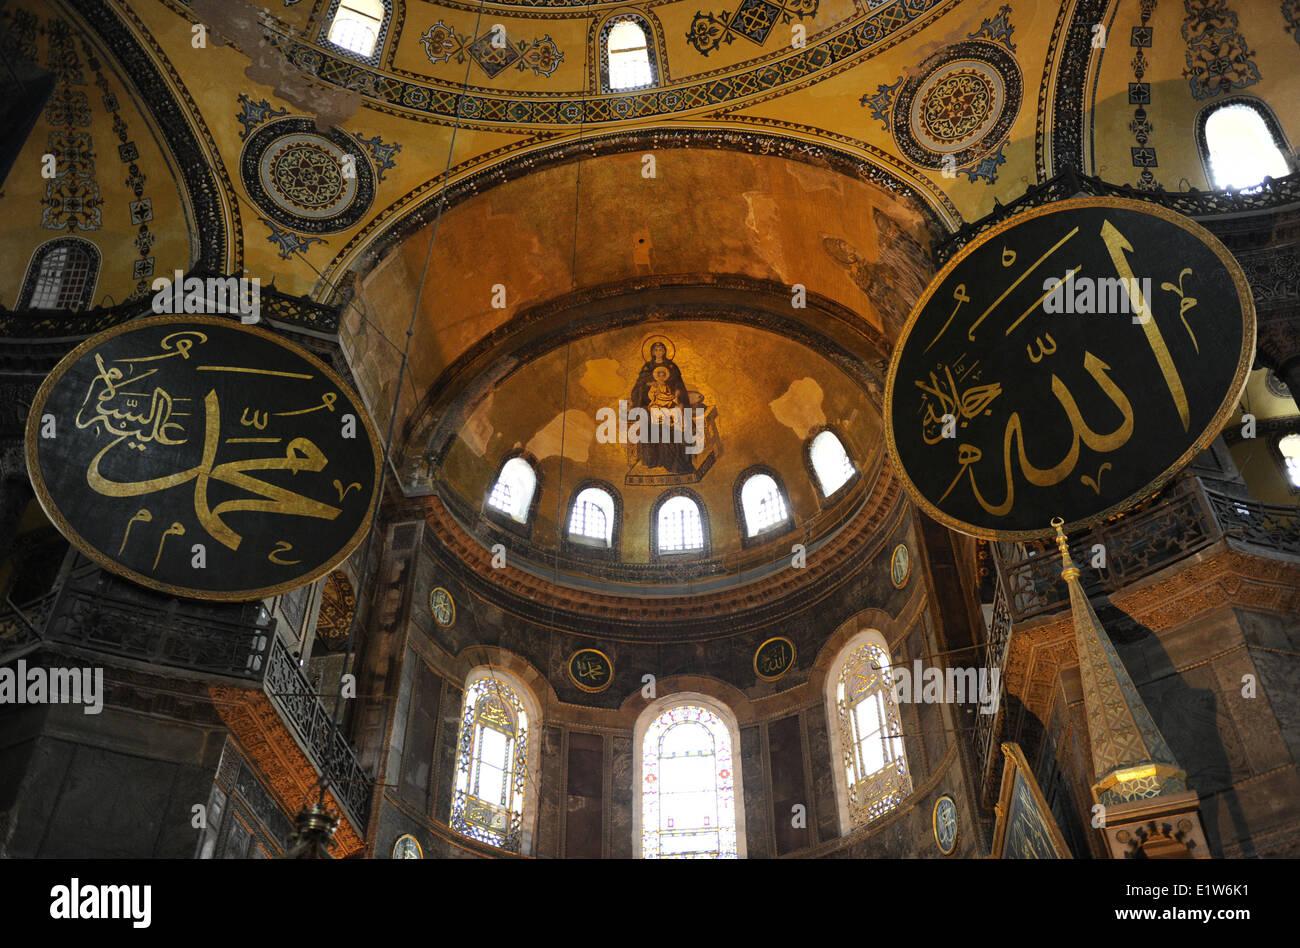 Turkey Istanbul Hagia Sophia Interior Apse Mosaic Of The Stock Photo Royalty Free Image